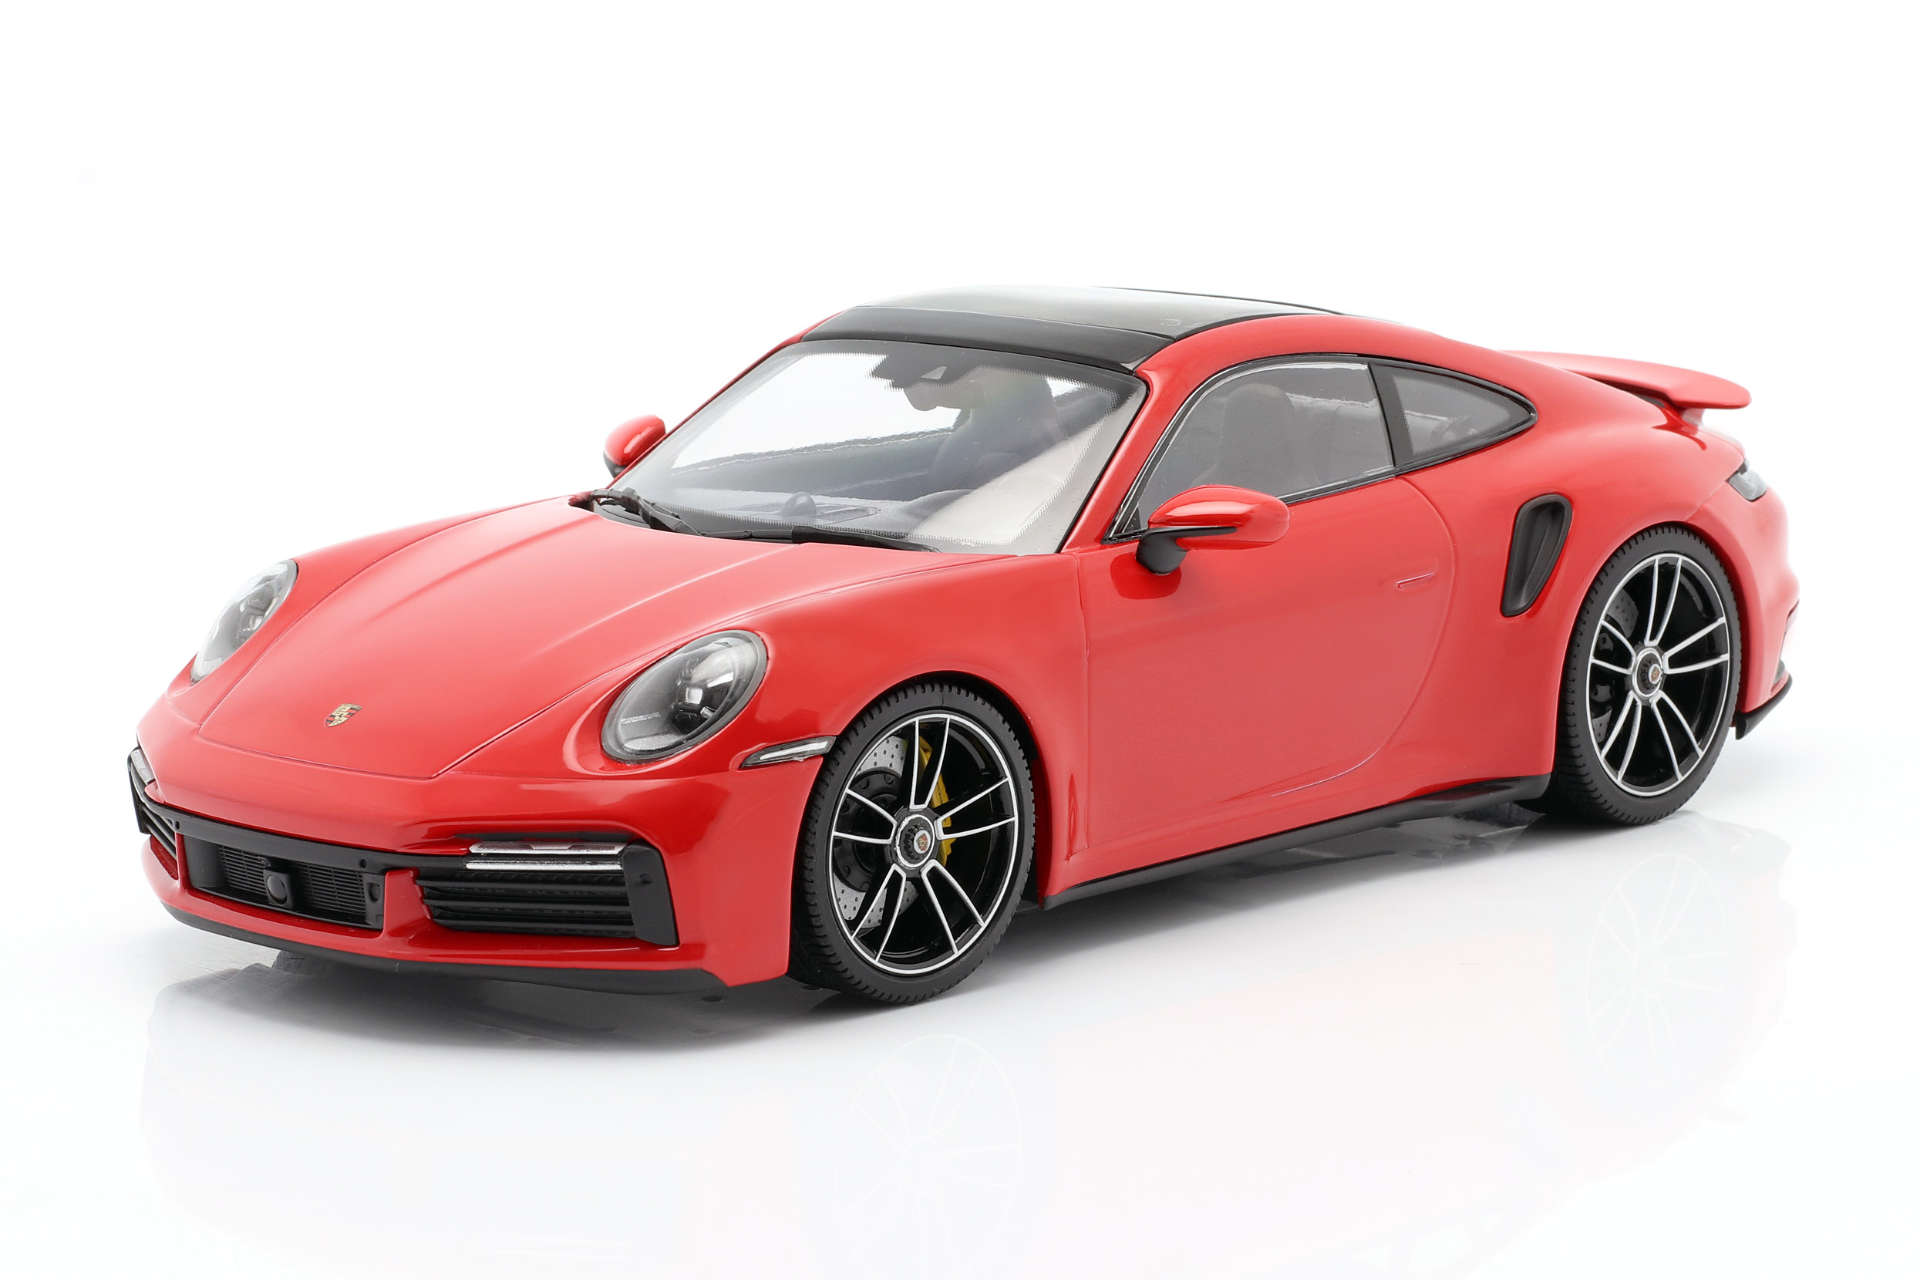 Minichamps Porsche 911 992 turbo indischrot